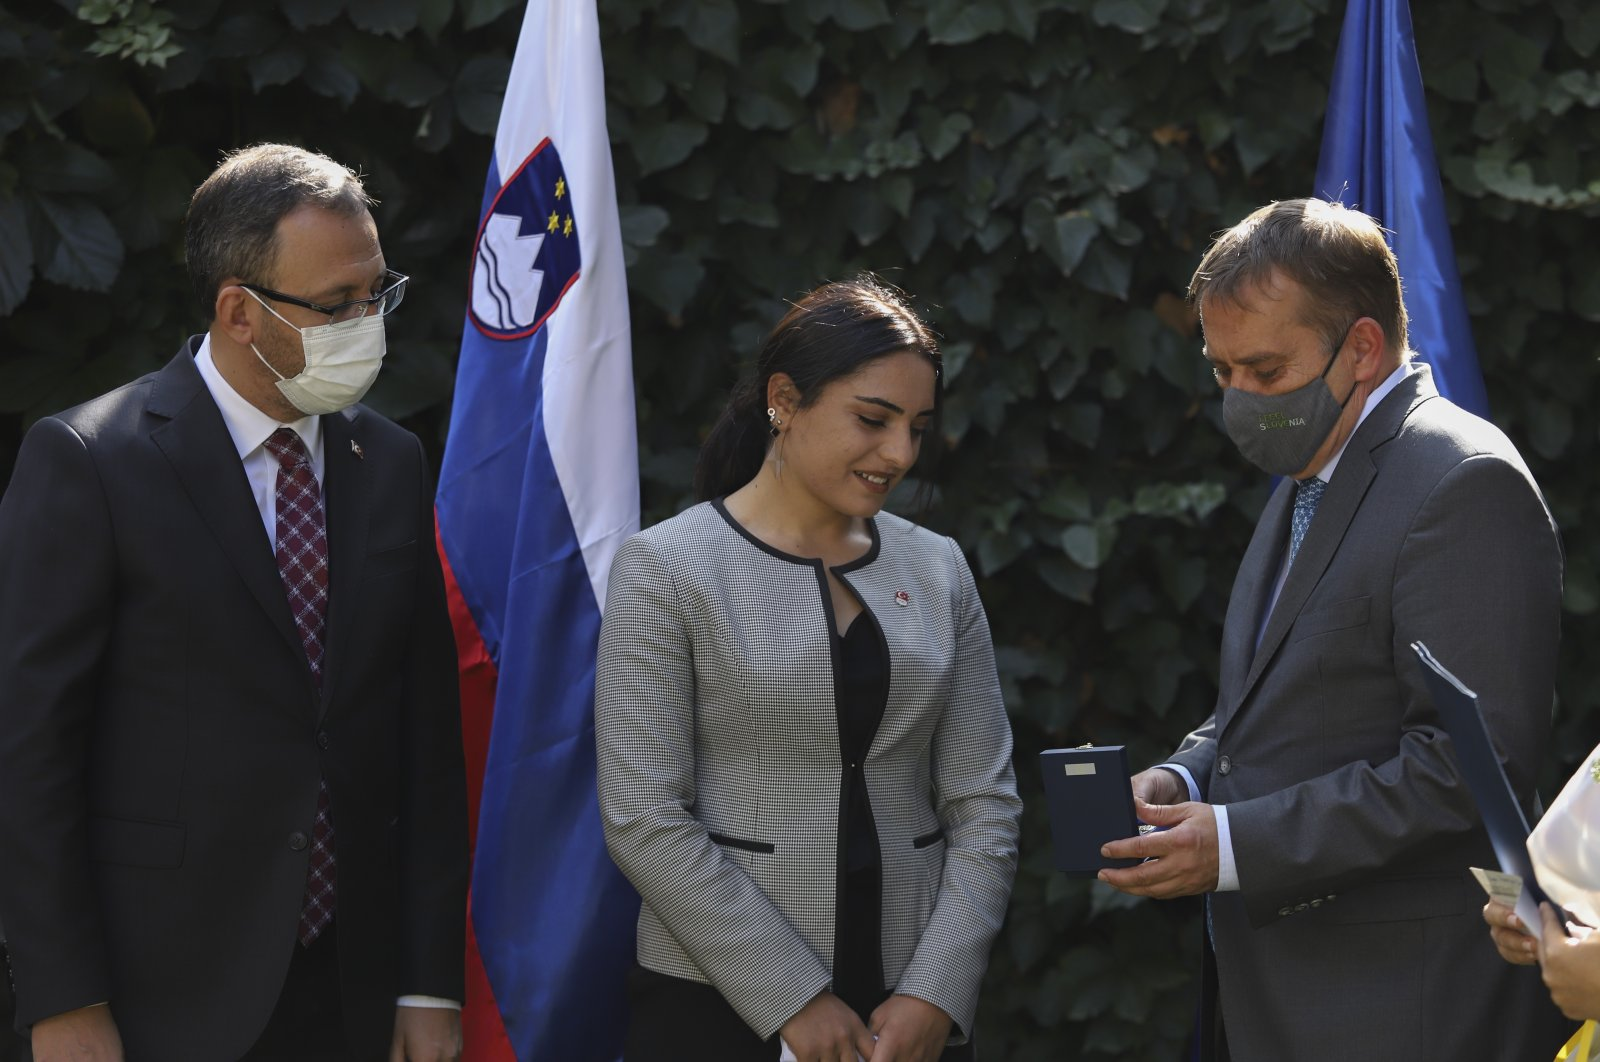 Slovenia's Ambassador Primoz Seligo (R) presents an award to Sıla Kara (C) at a ceremony, in the capital Ankara, Turkey, Oct. 15, 2020. (İHA Photo)